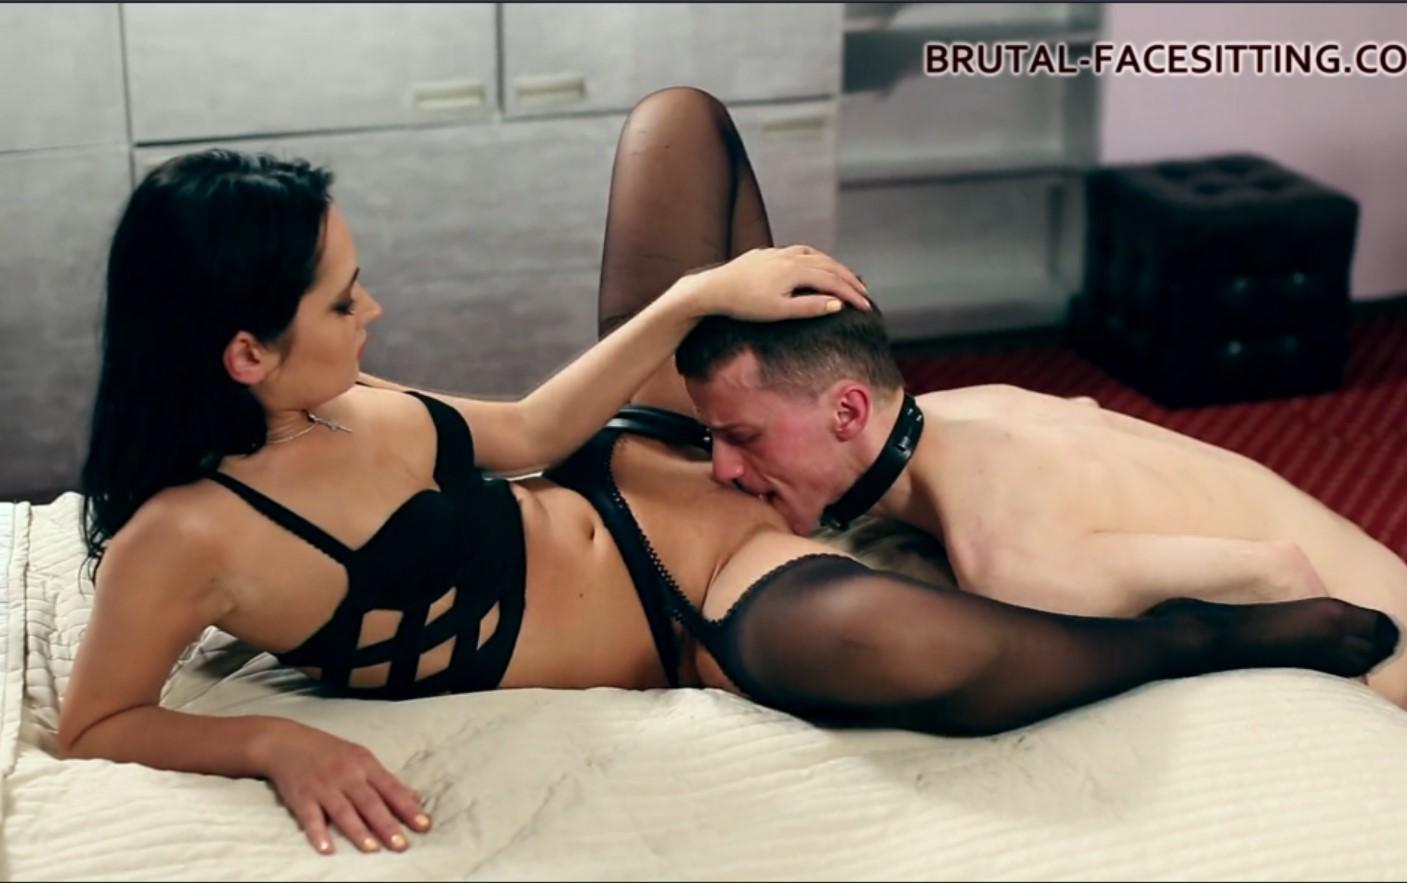 Angie Moon - 10 июня 2016 порно порно